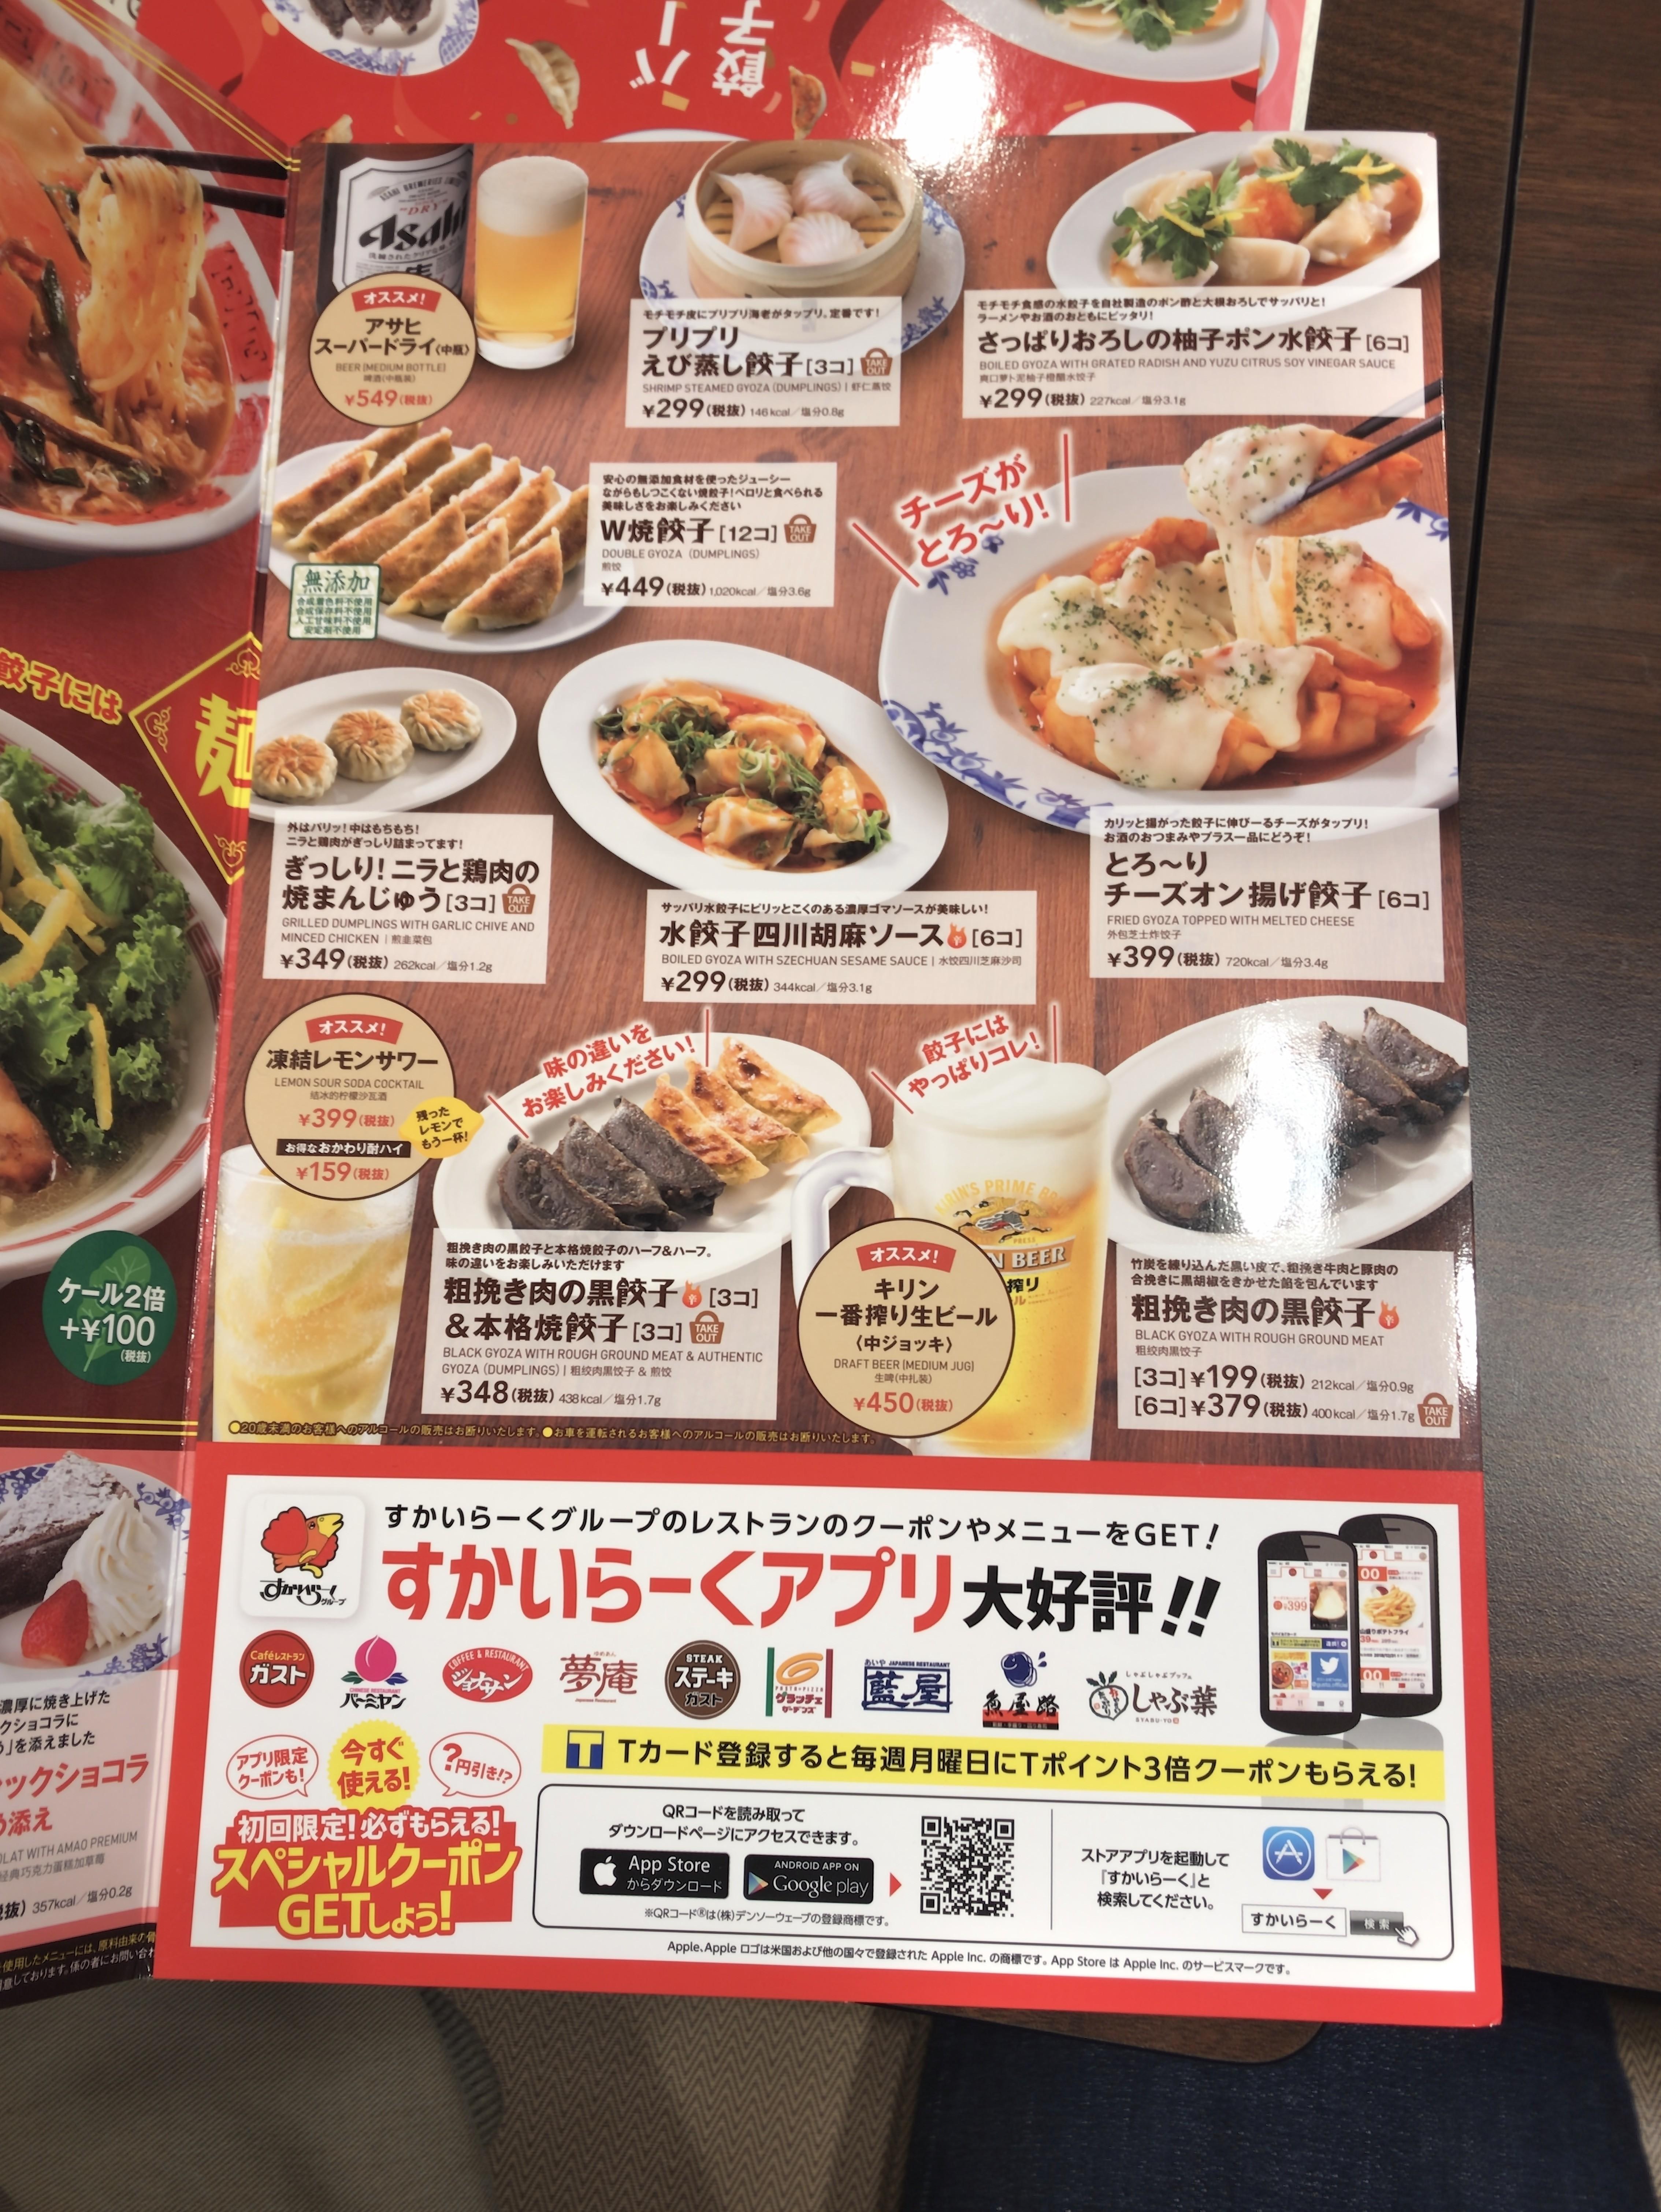 バーミヤン 餃子博覧会